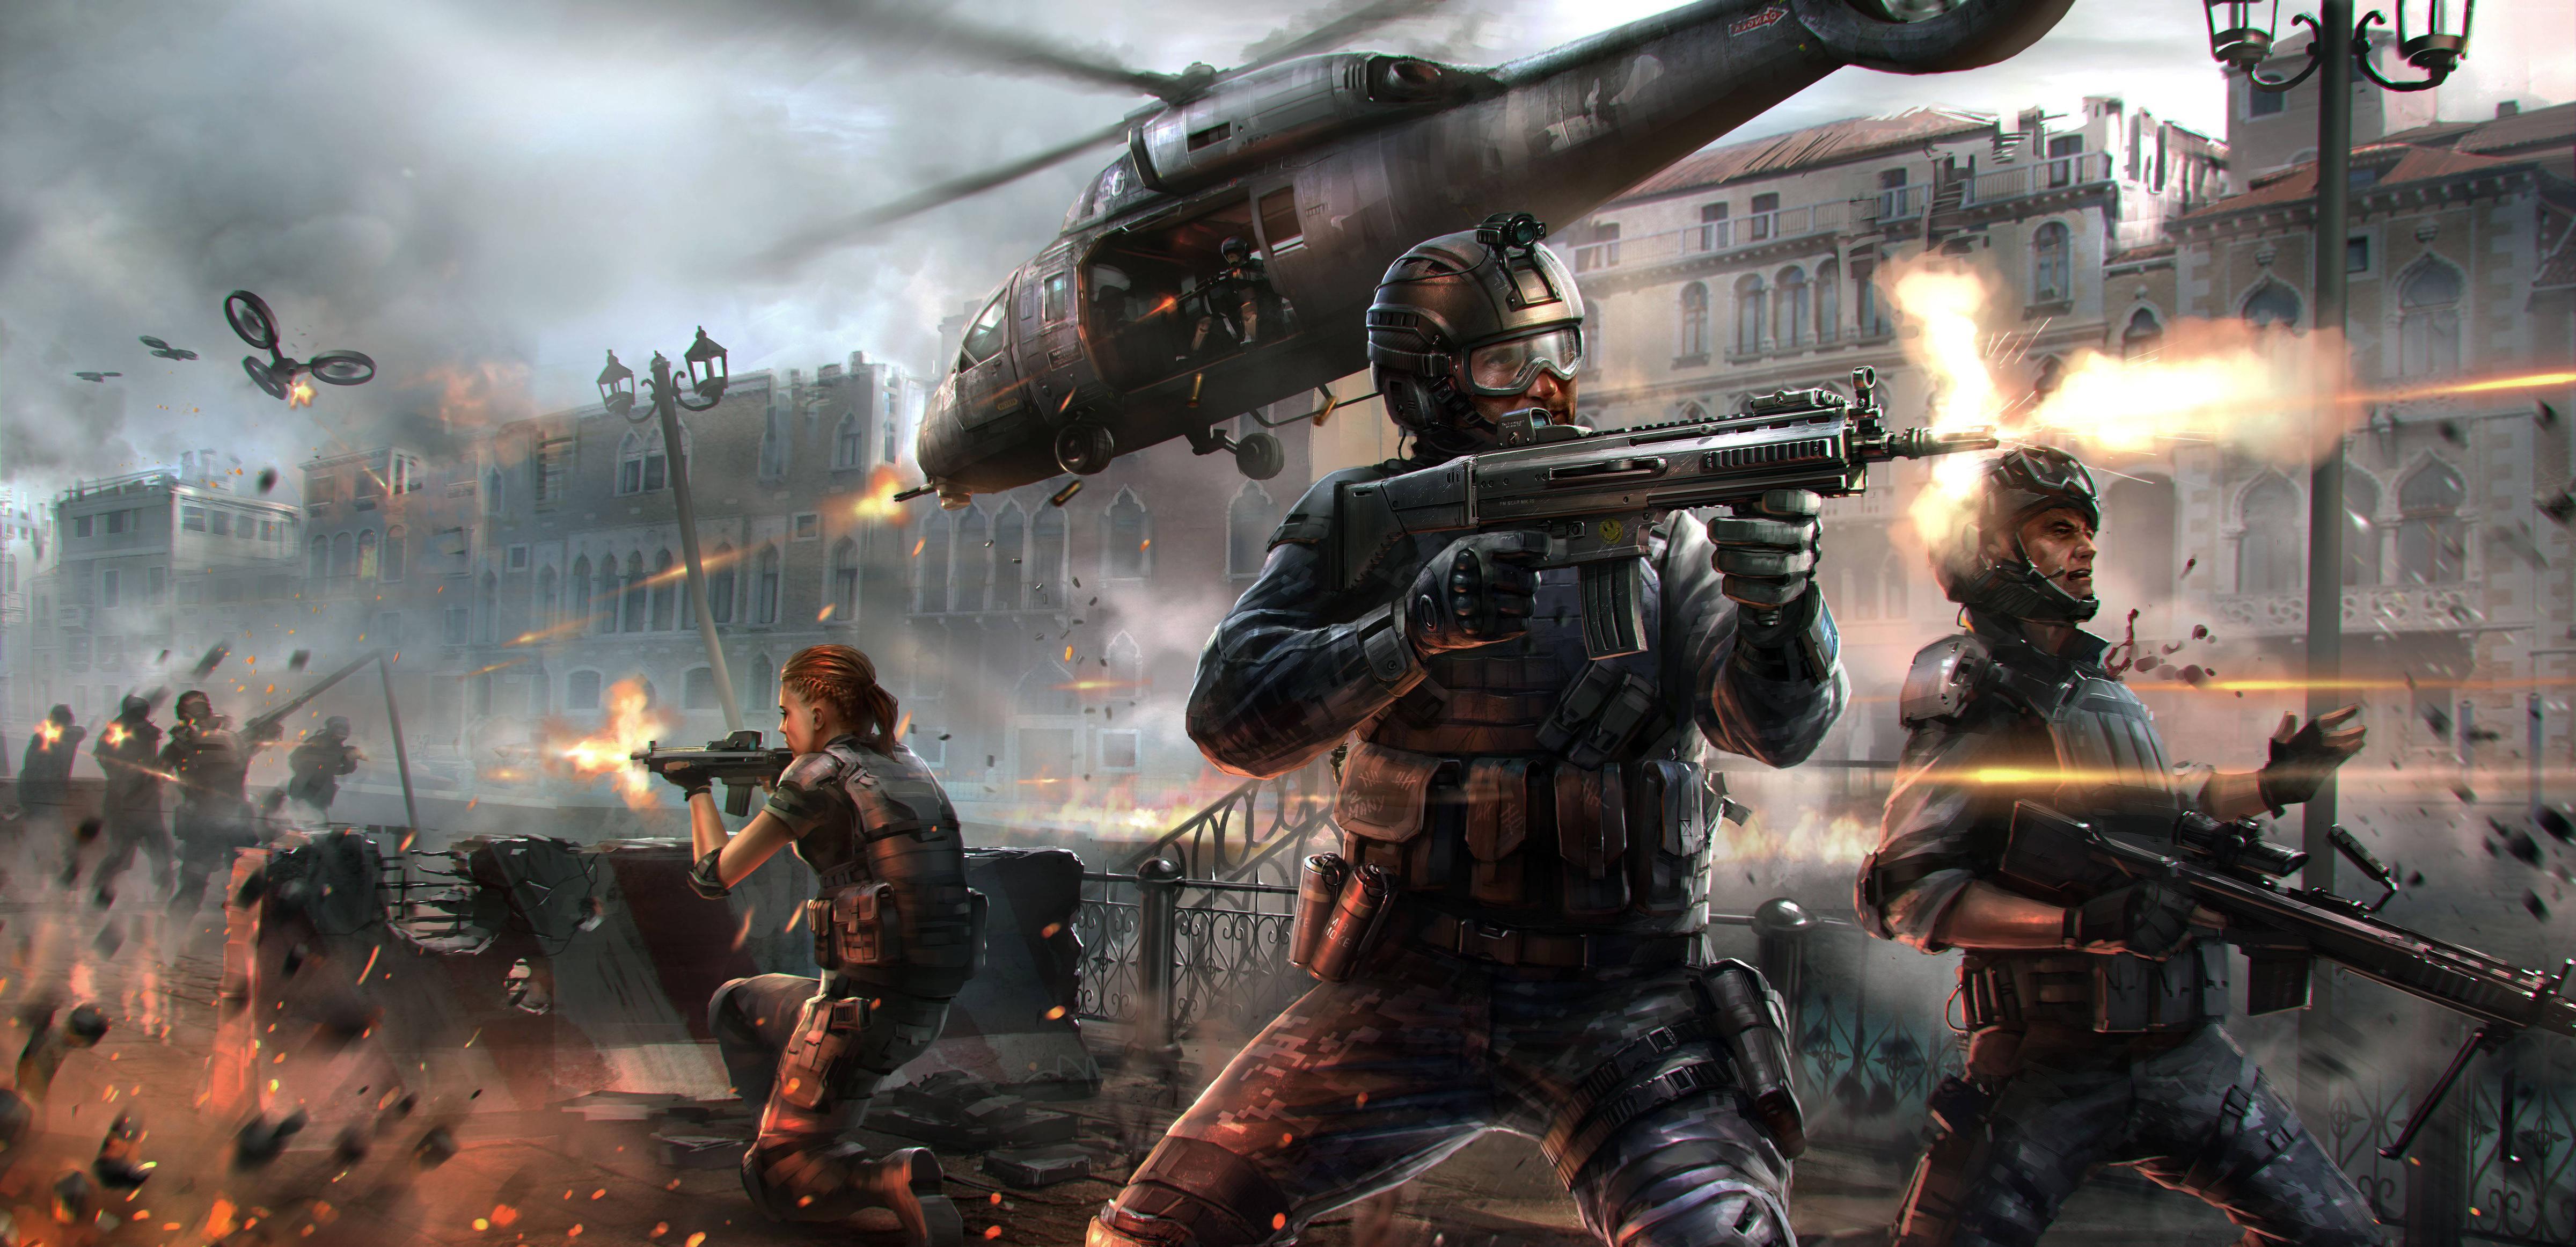 Wallpaper modern combat 5 blackout game mmo shooter mmofps battle soldier weapon gun